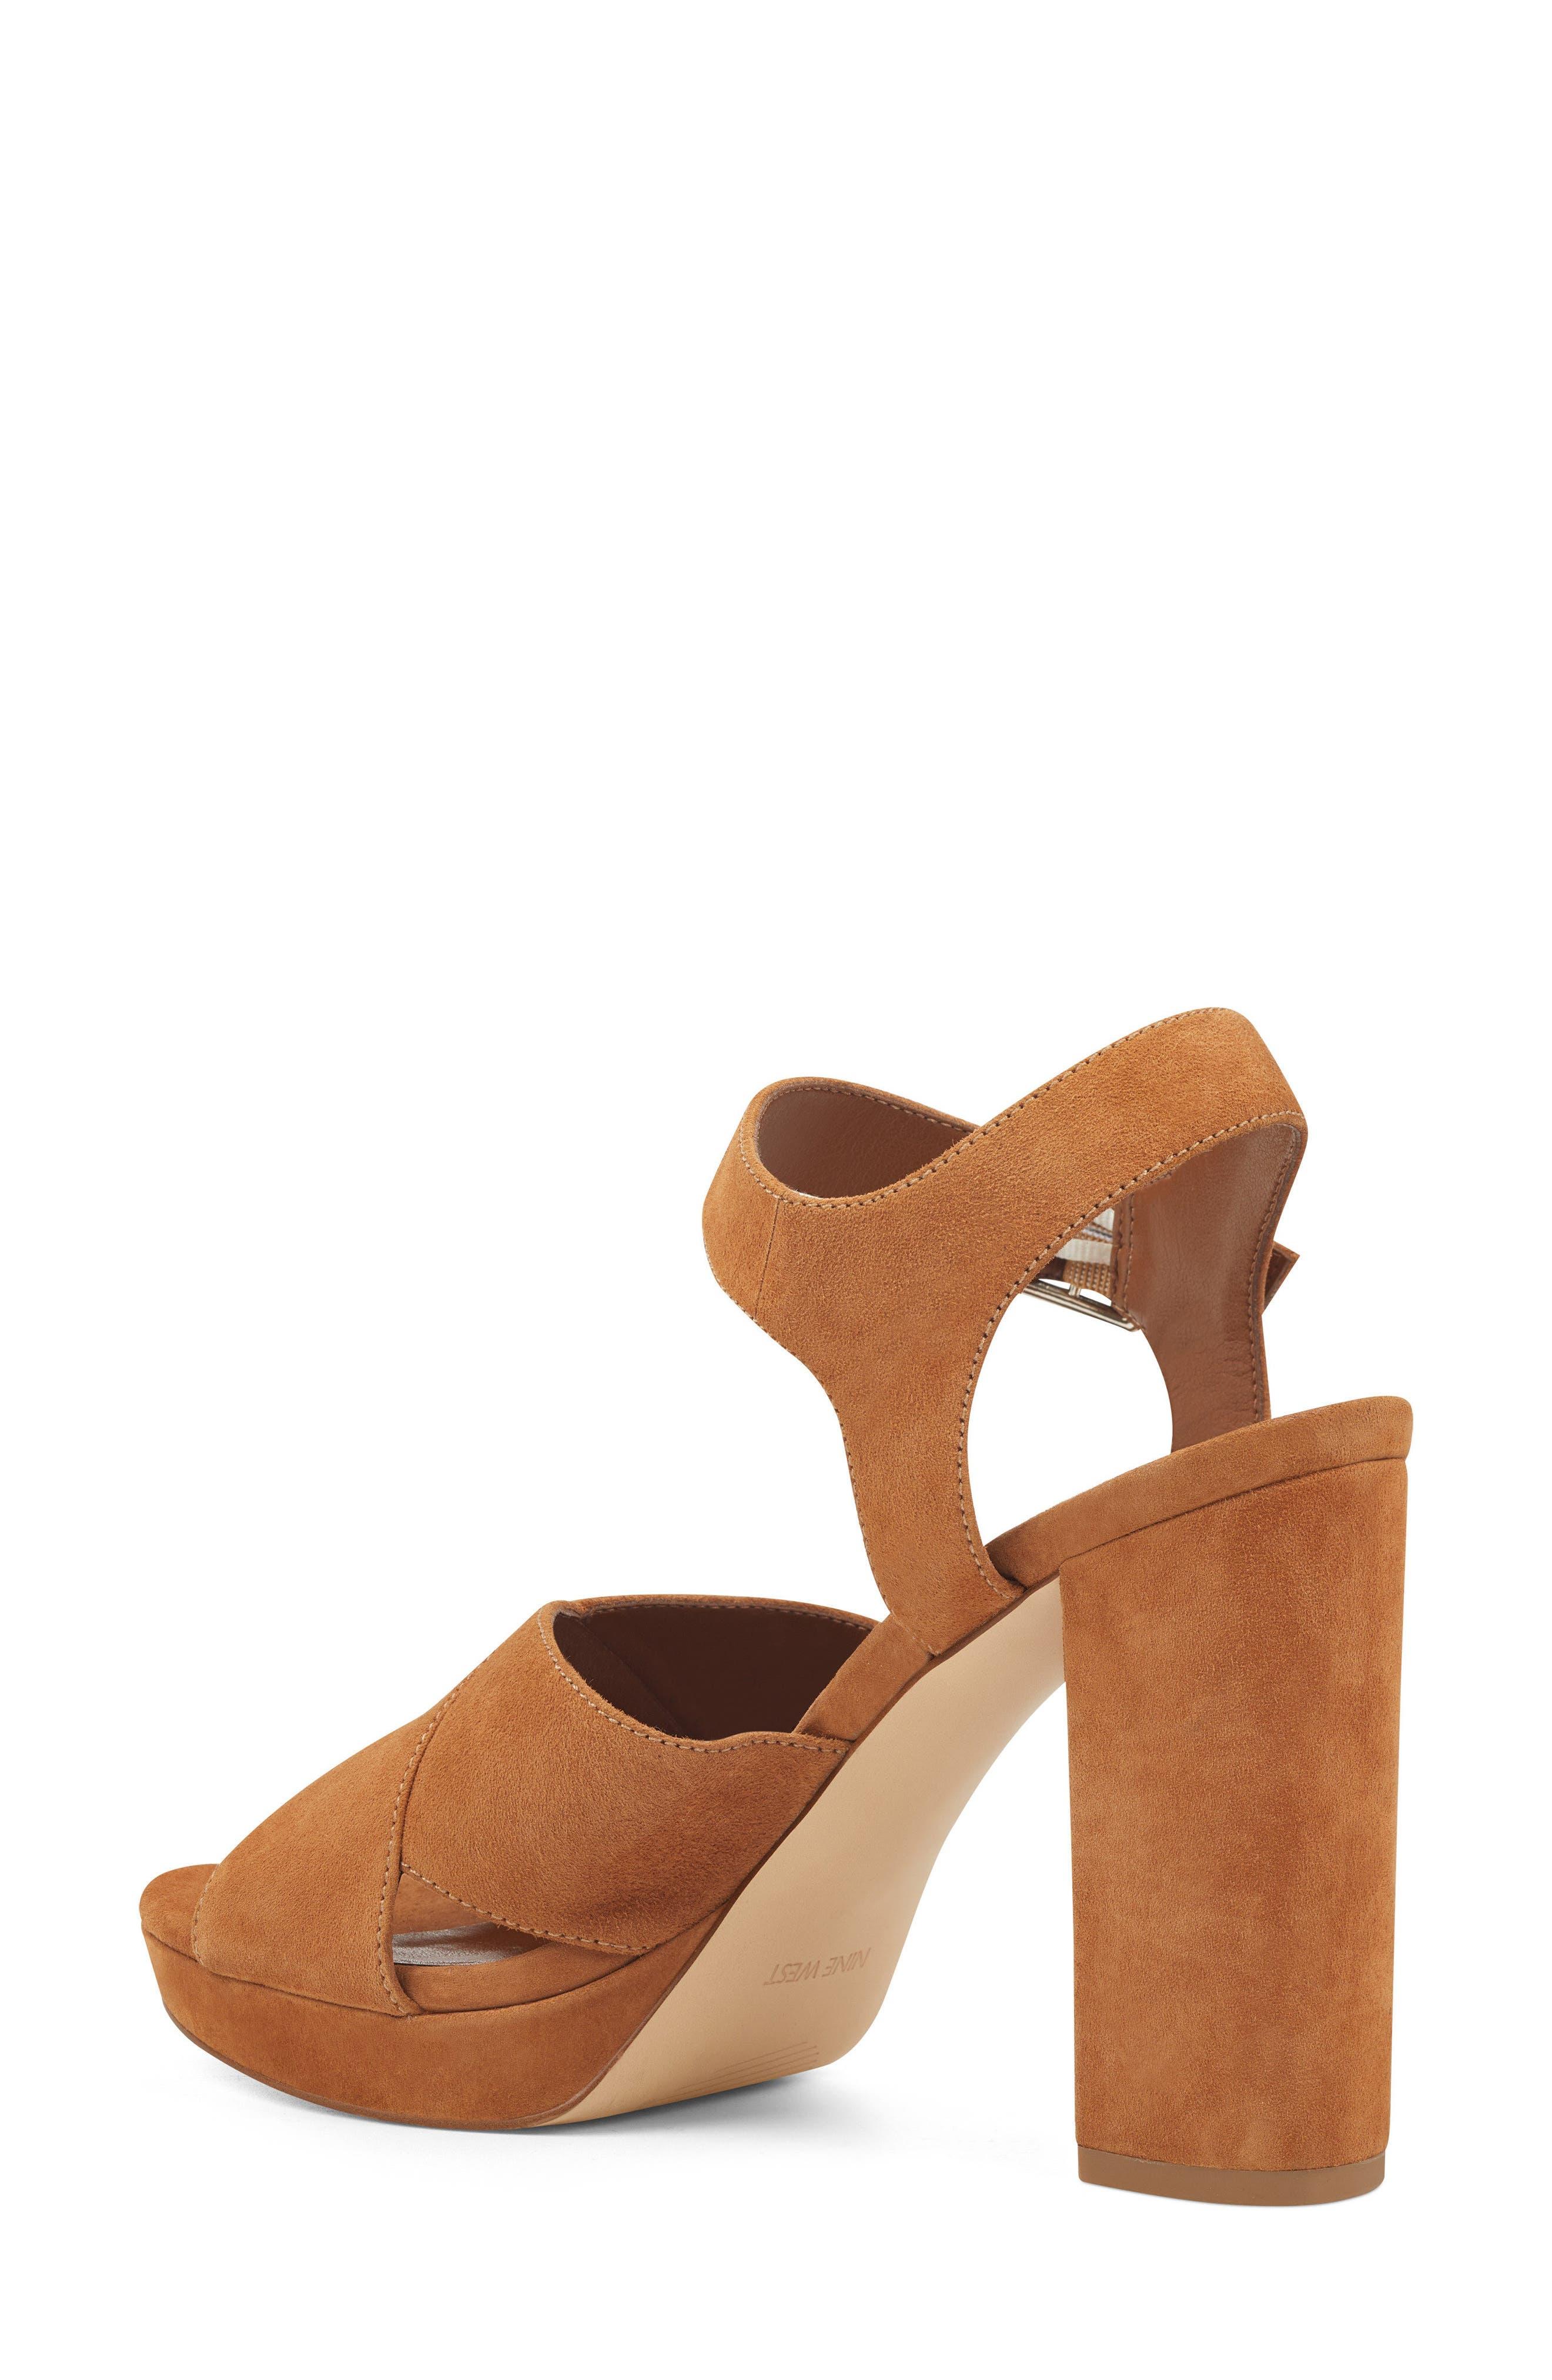 Jimar Platform Sandal,                             Alternate thumbnail 2, color,                             DARK NATURAL SUEDE